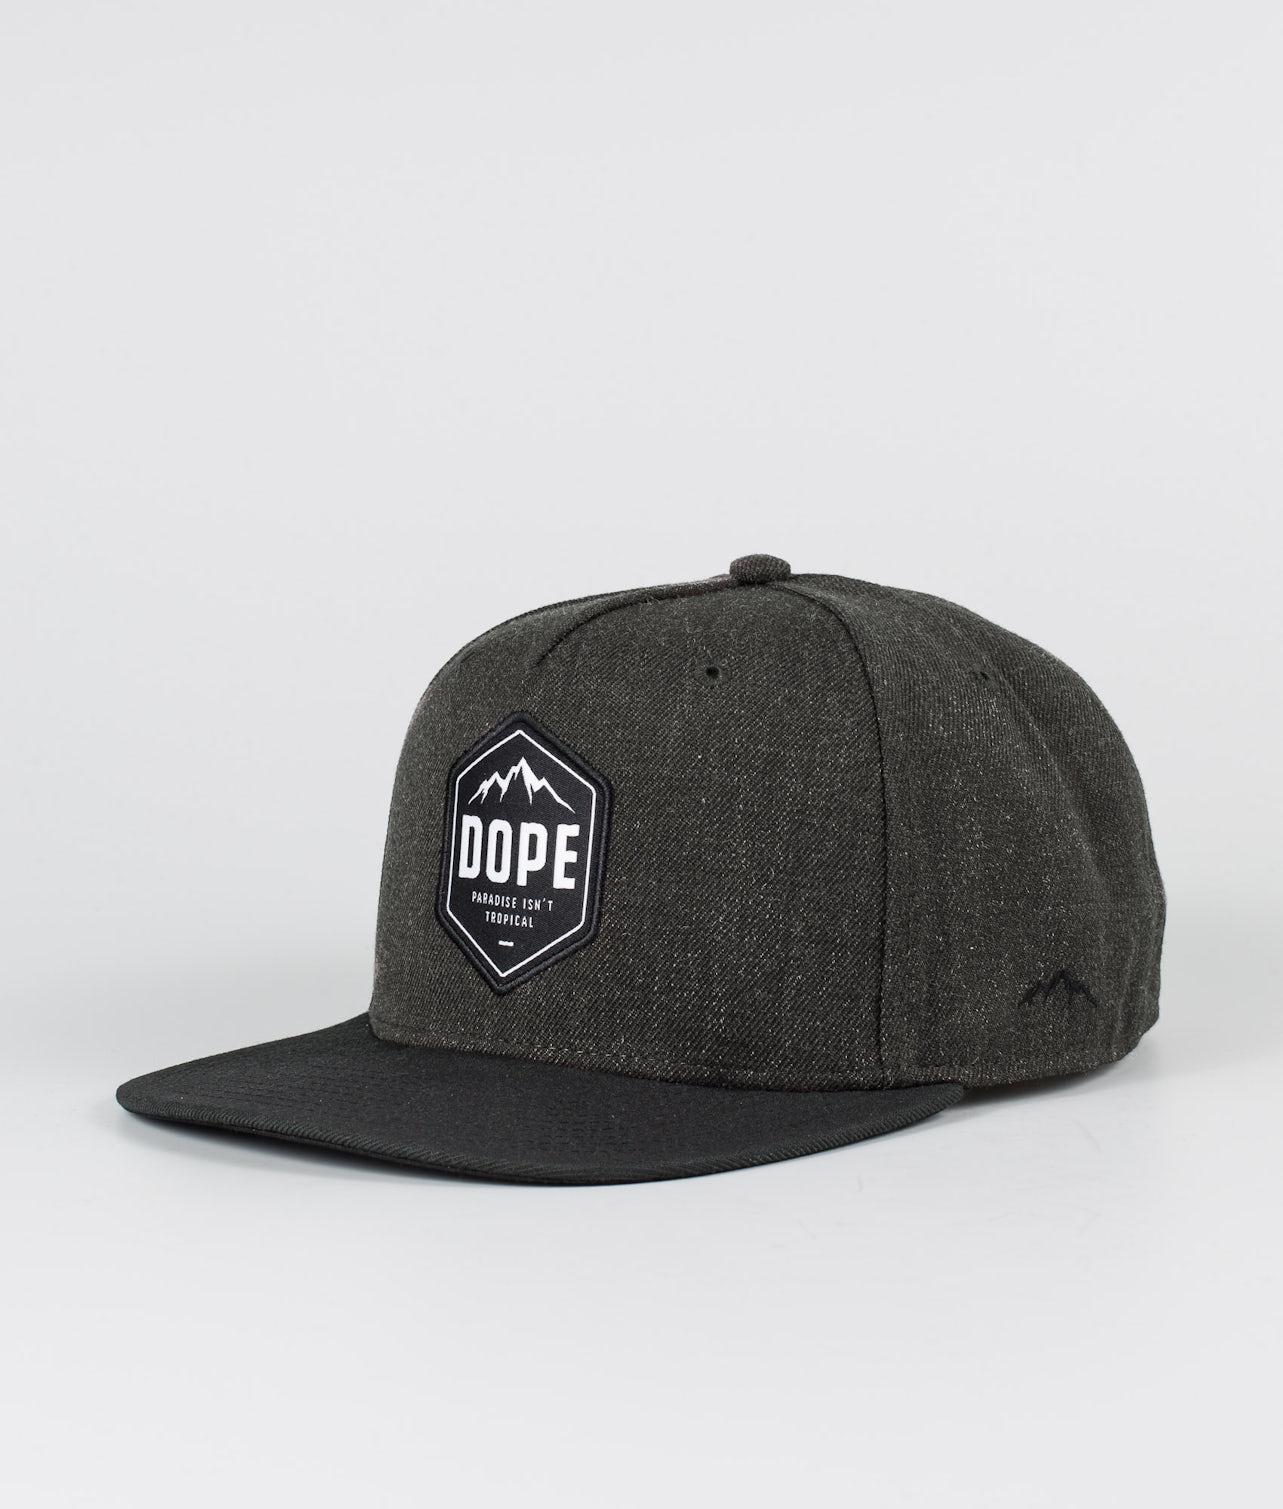 Dope Patched Caps Dark Grey Black